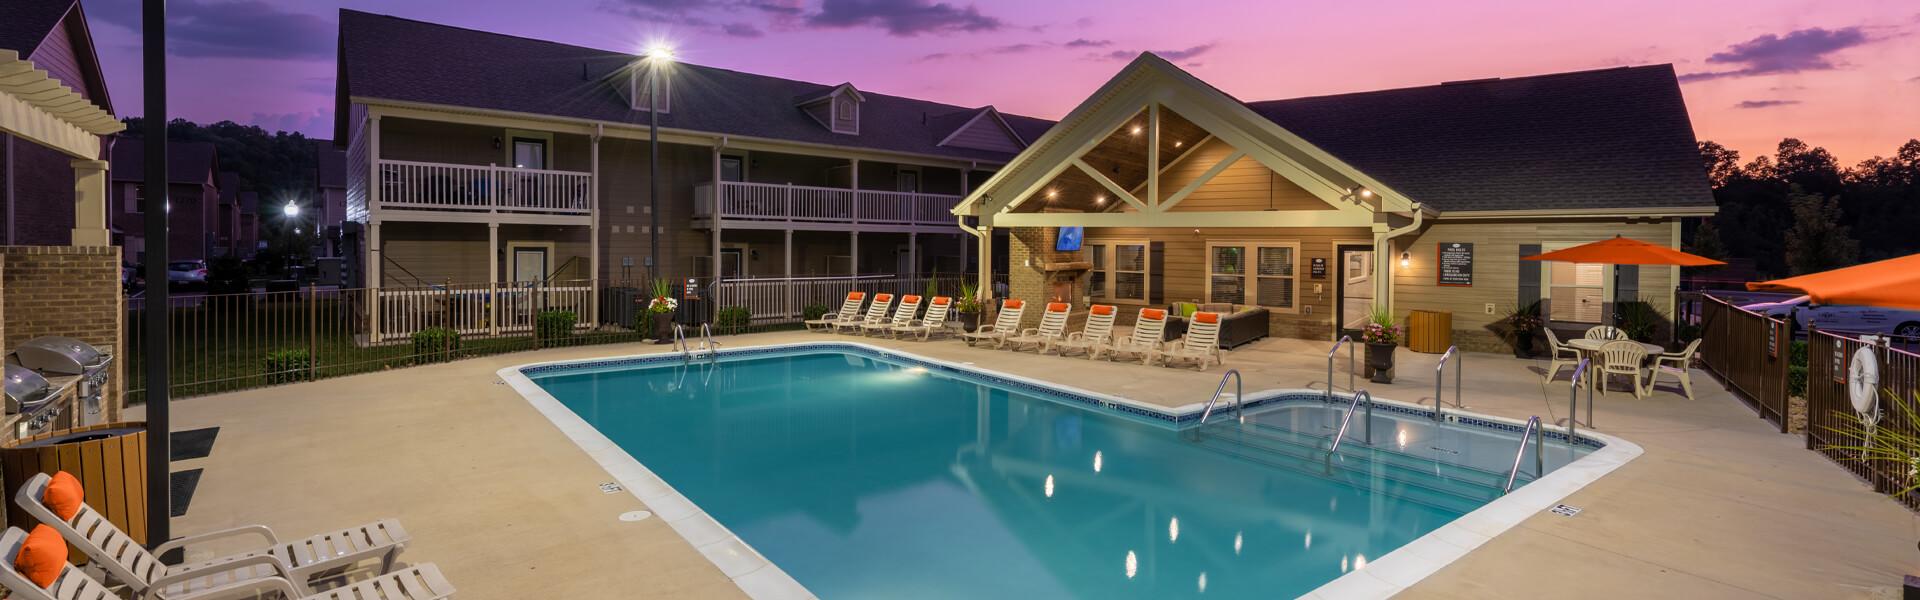 HI-RiverBend-Pool Sunset-fix